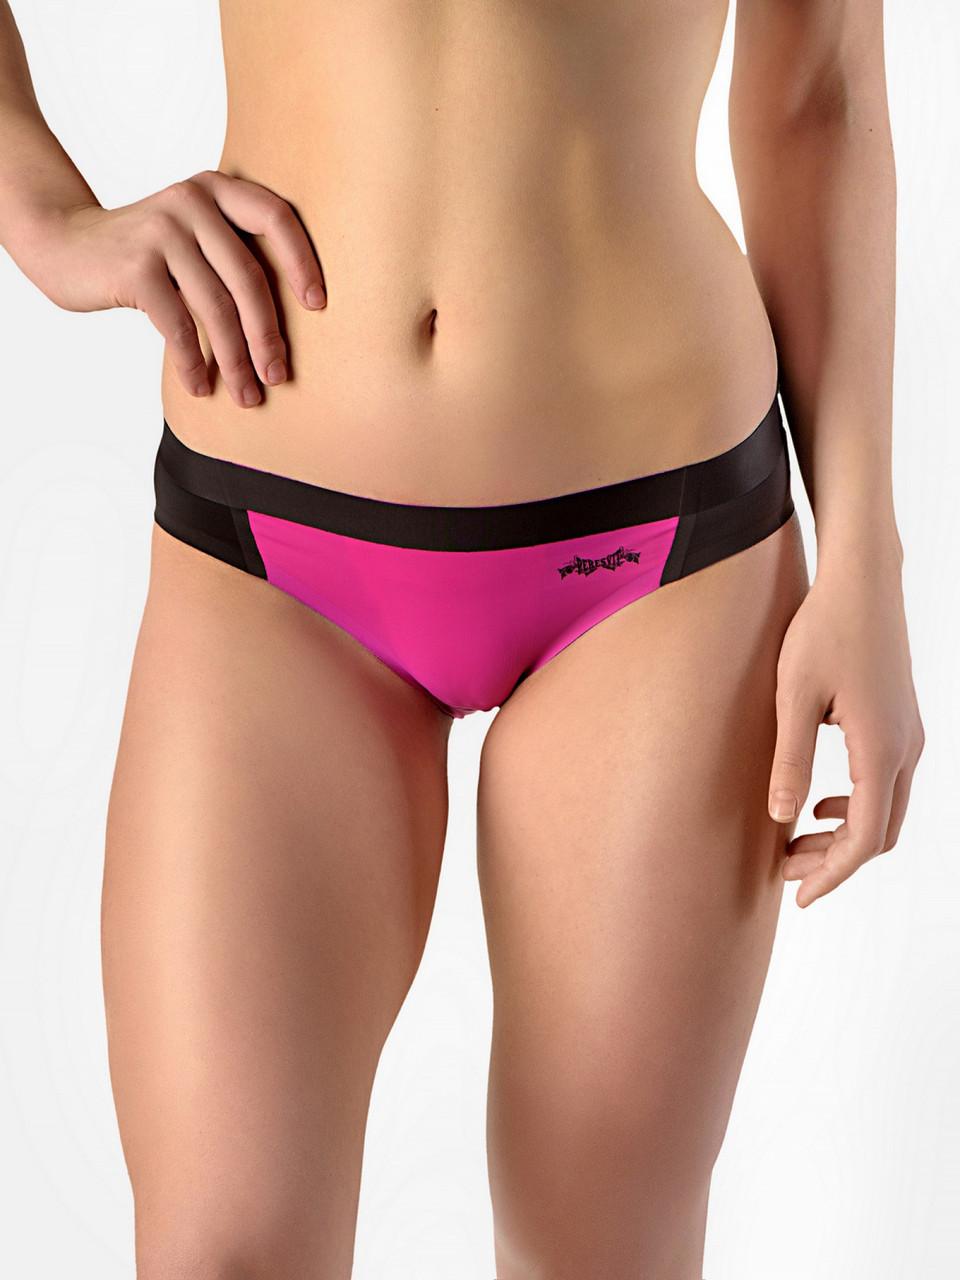 Женские трусы спортивные Peresvit Performance Women's Bikini Neon Pink